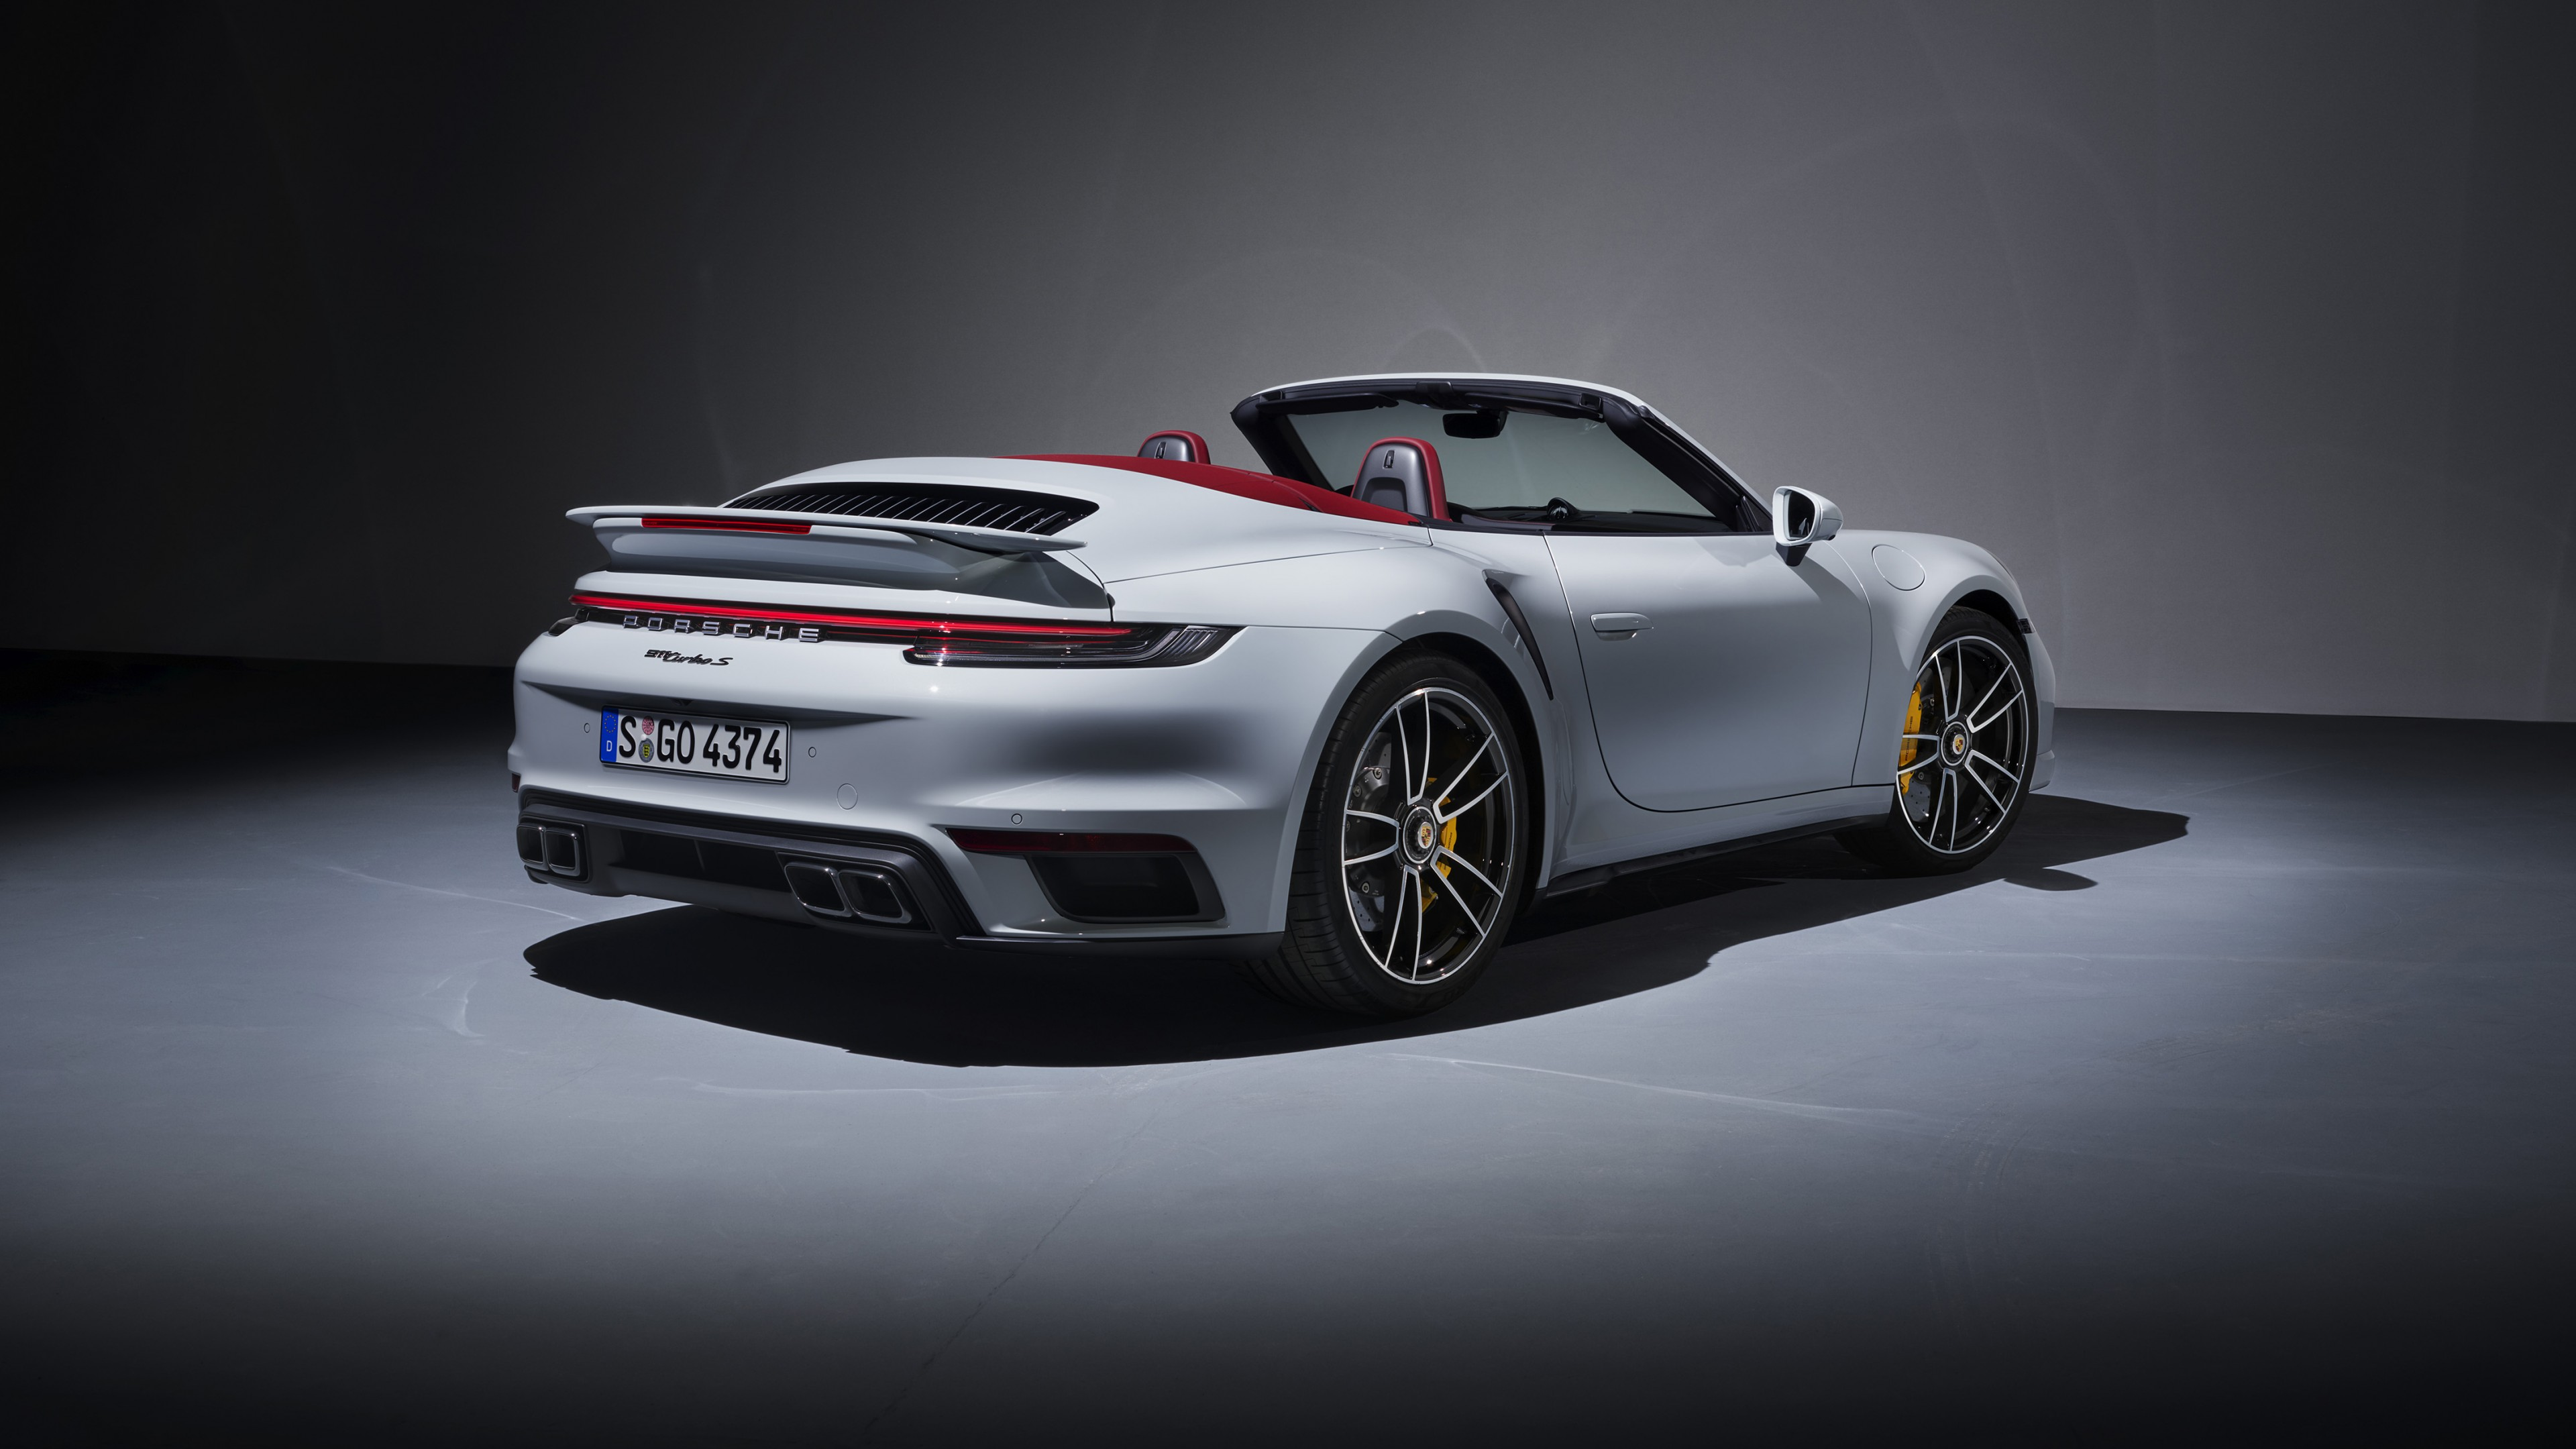 Porsche 911 Turbo S Cabriolet 2020 4k 2 Wallpaper Hd Car Wallpapers Id 14595